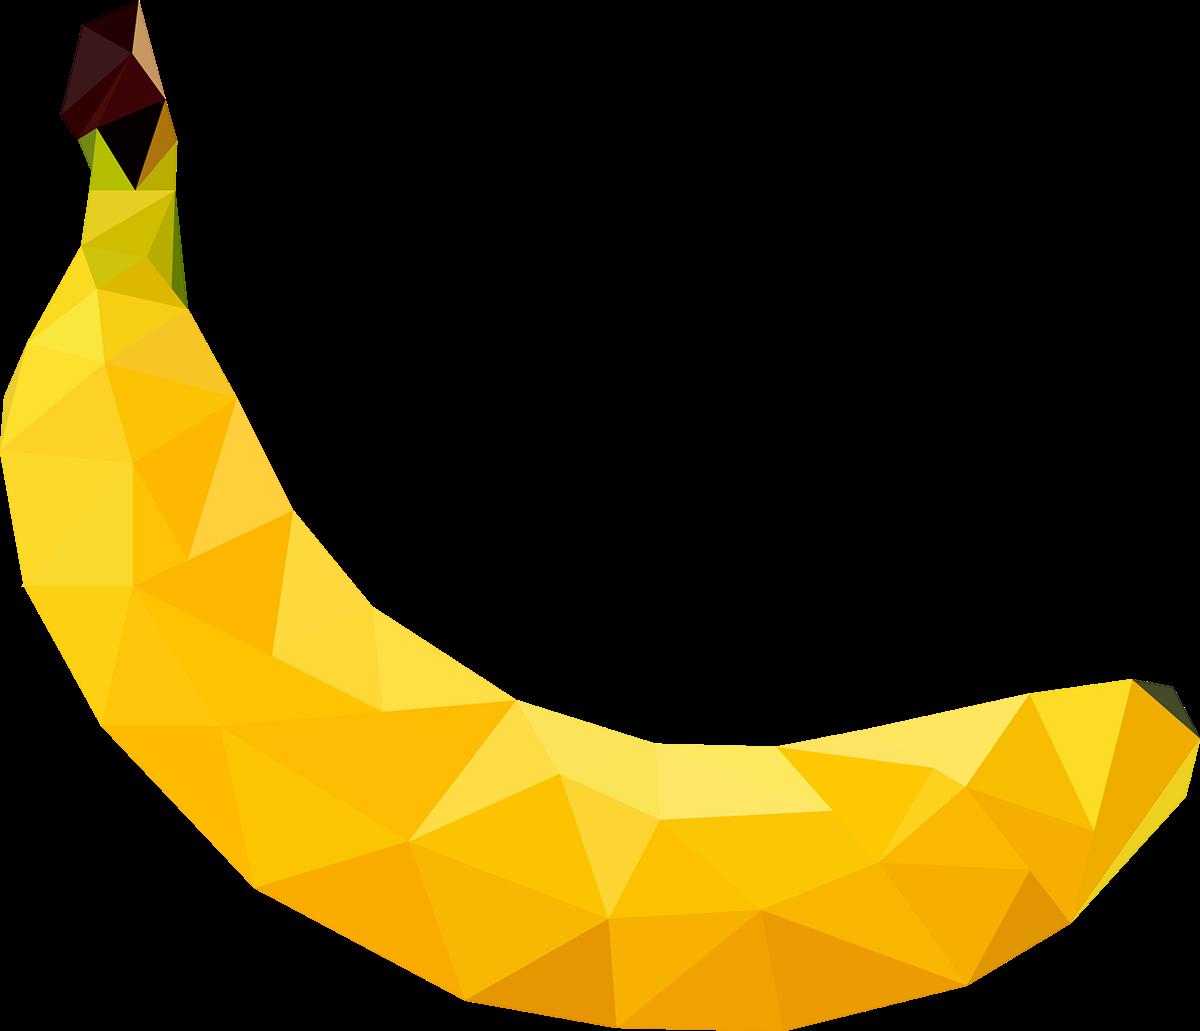 Mango clipart banana. Infographics about bats on